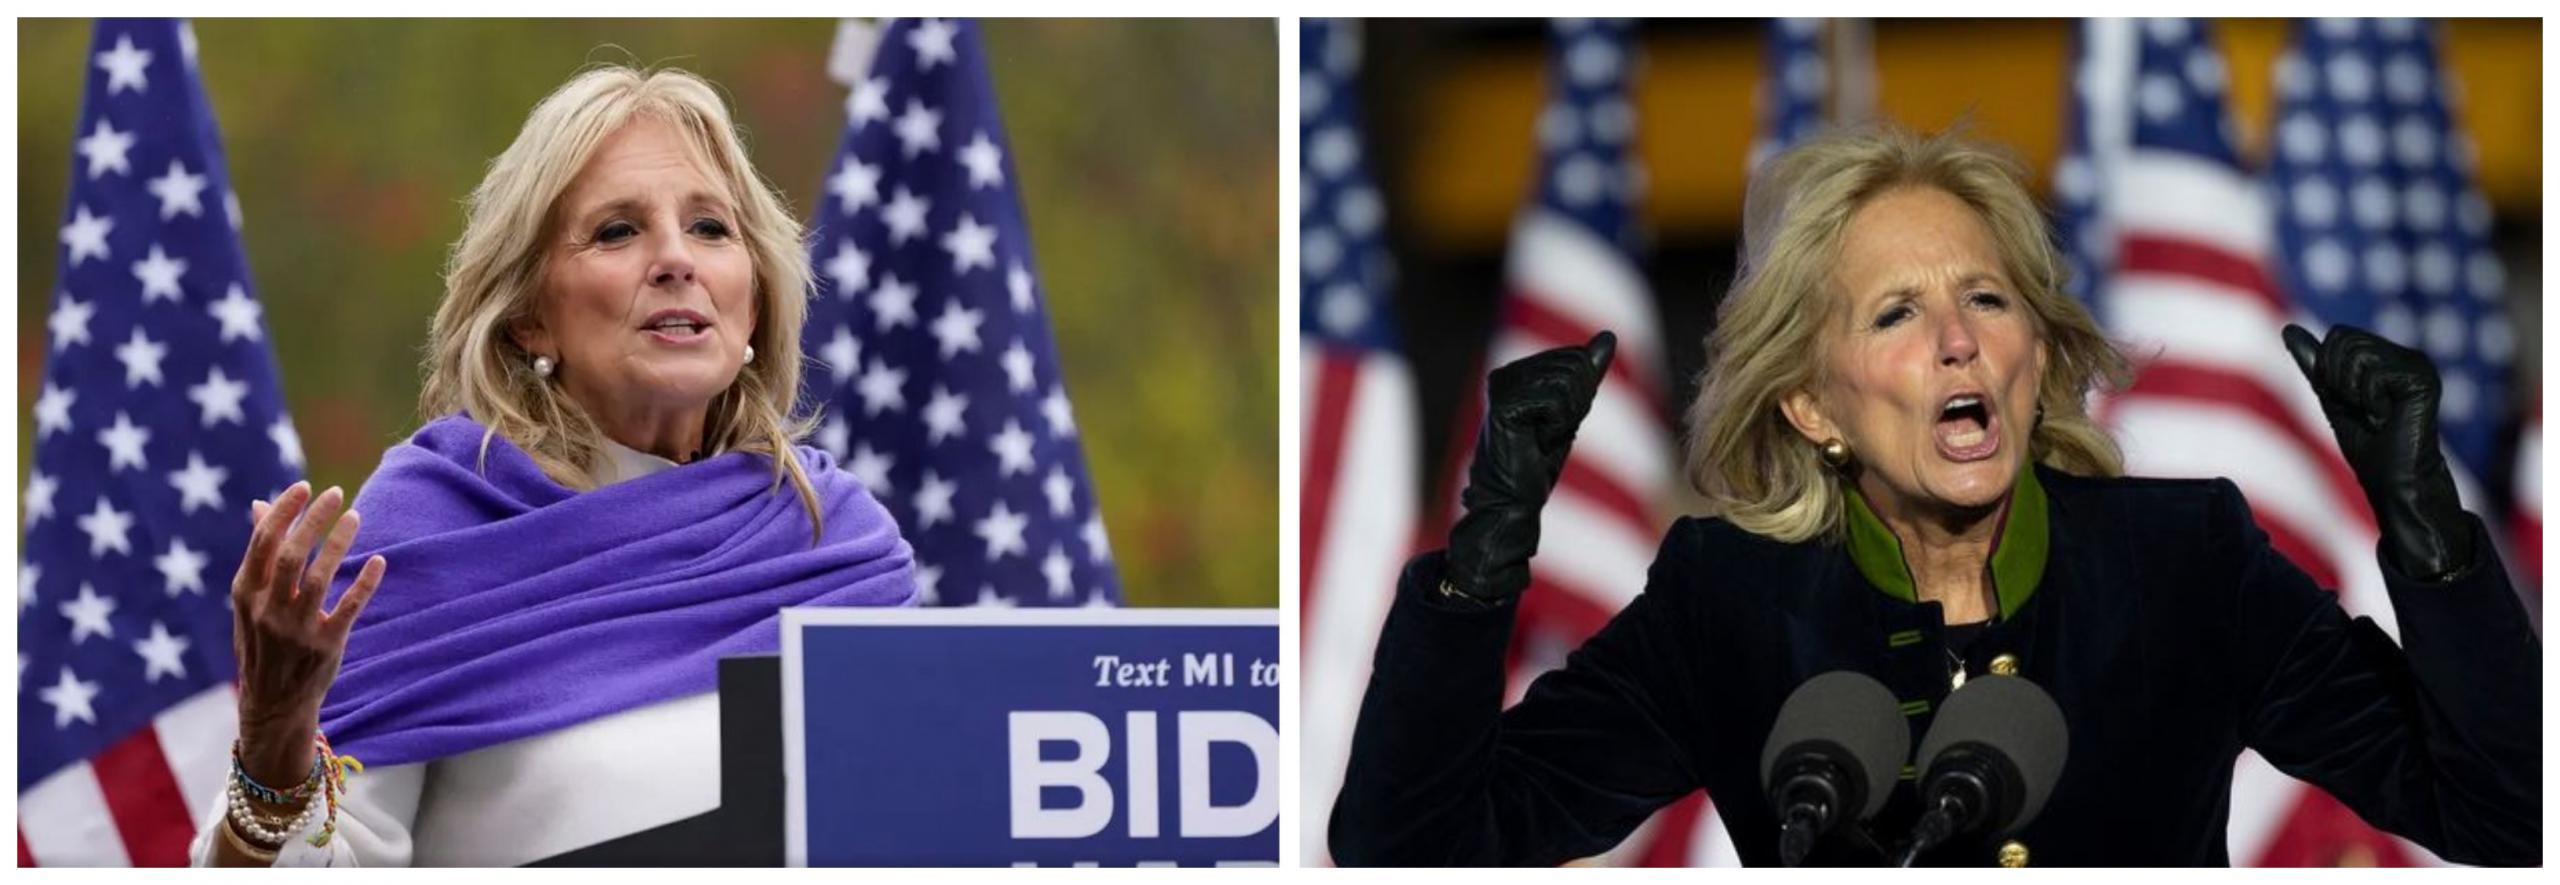 Jill Biden na predvolilnih shodih. Vir: Twitter